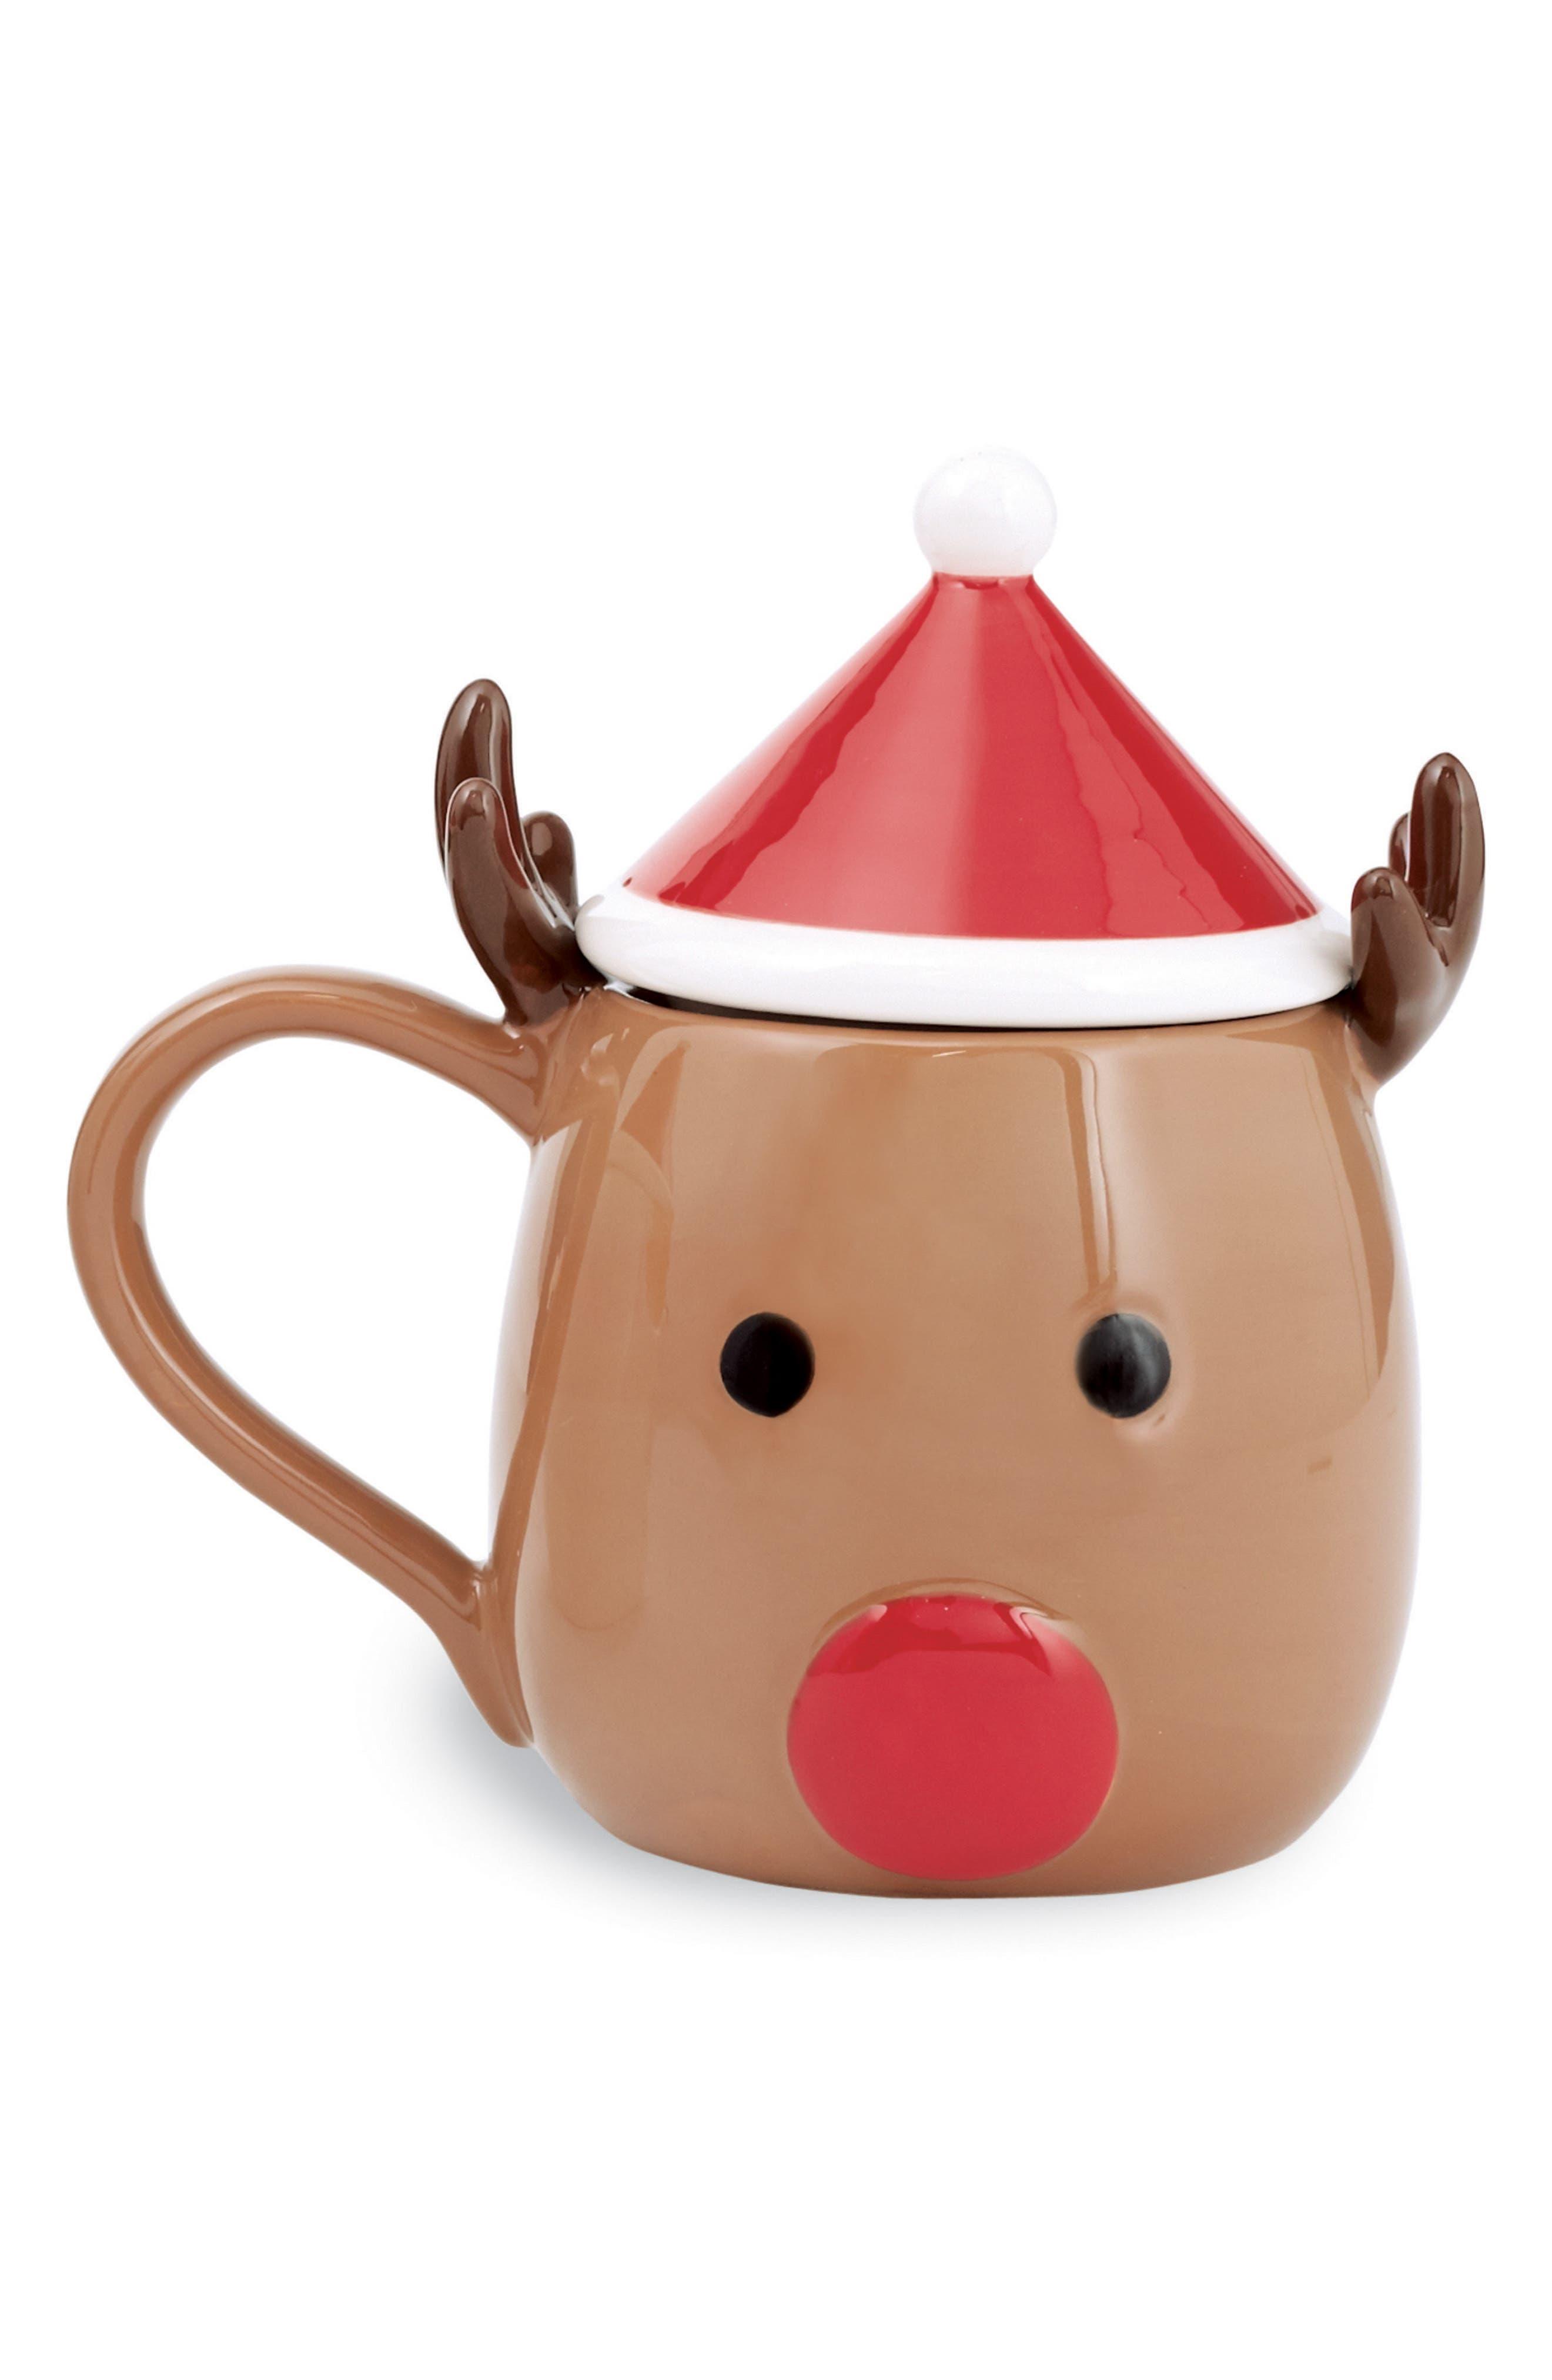 Main Image - Mud Pie Reindeer Ceramic Mug & Lid